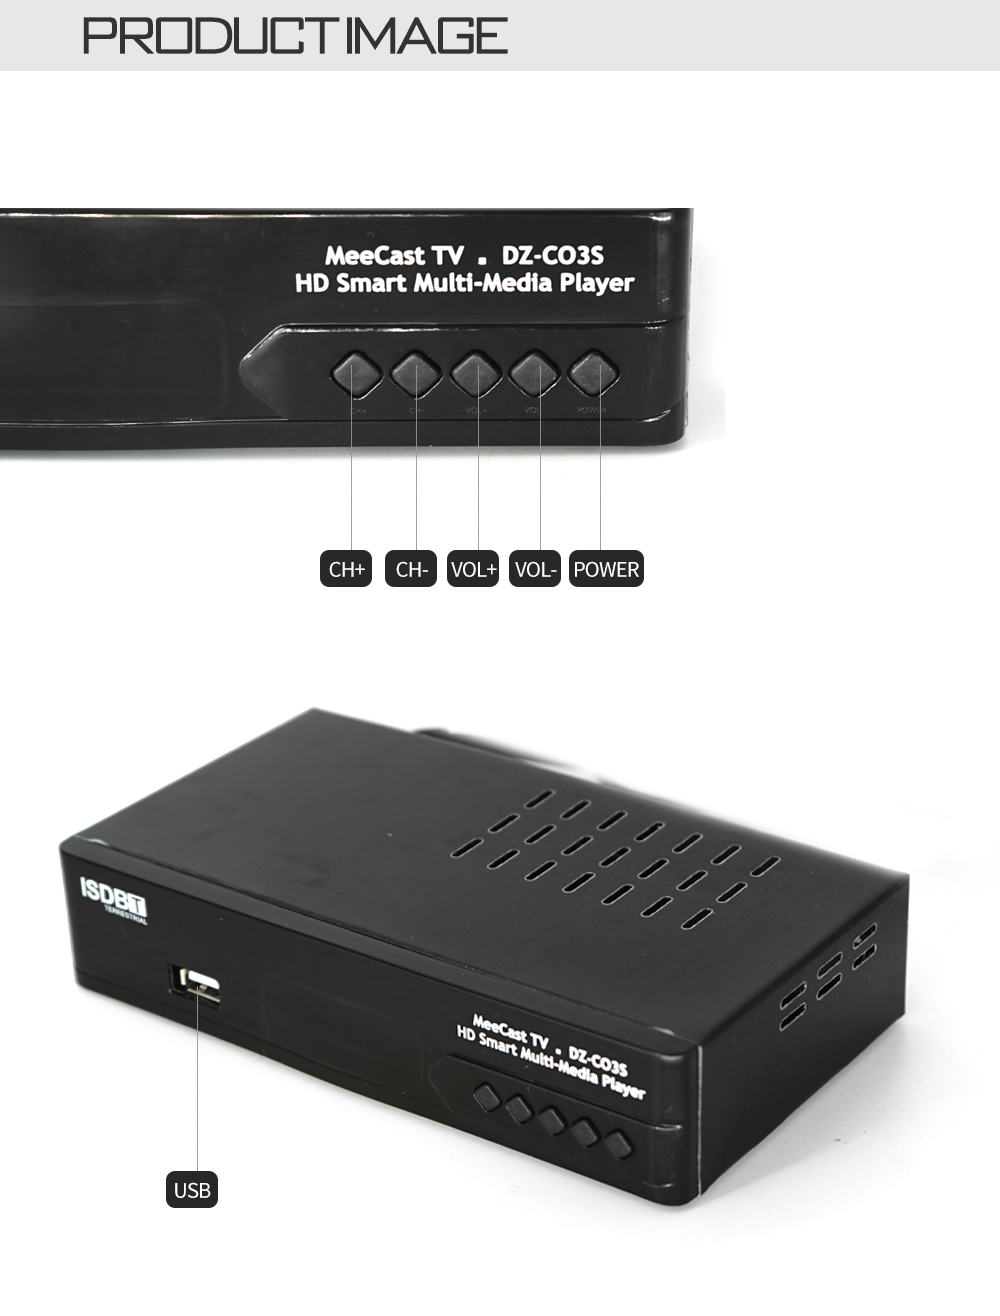 Digital Terrestrial ISDB-T TV Tuner Receiver Set-Top Box Fully HD 1080P H.264 USB Decoder for Brazil Chile Peru 8 -